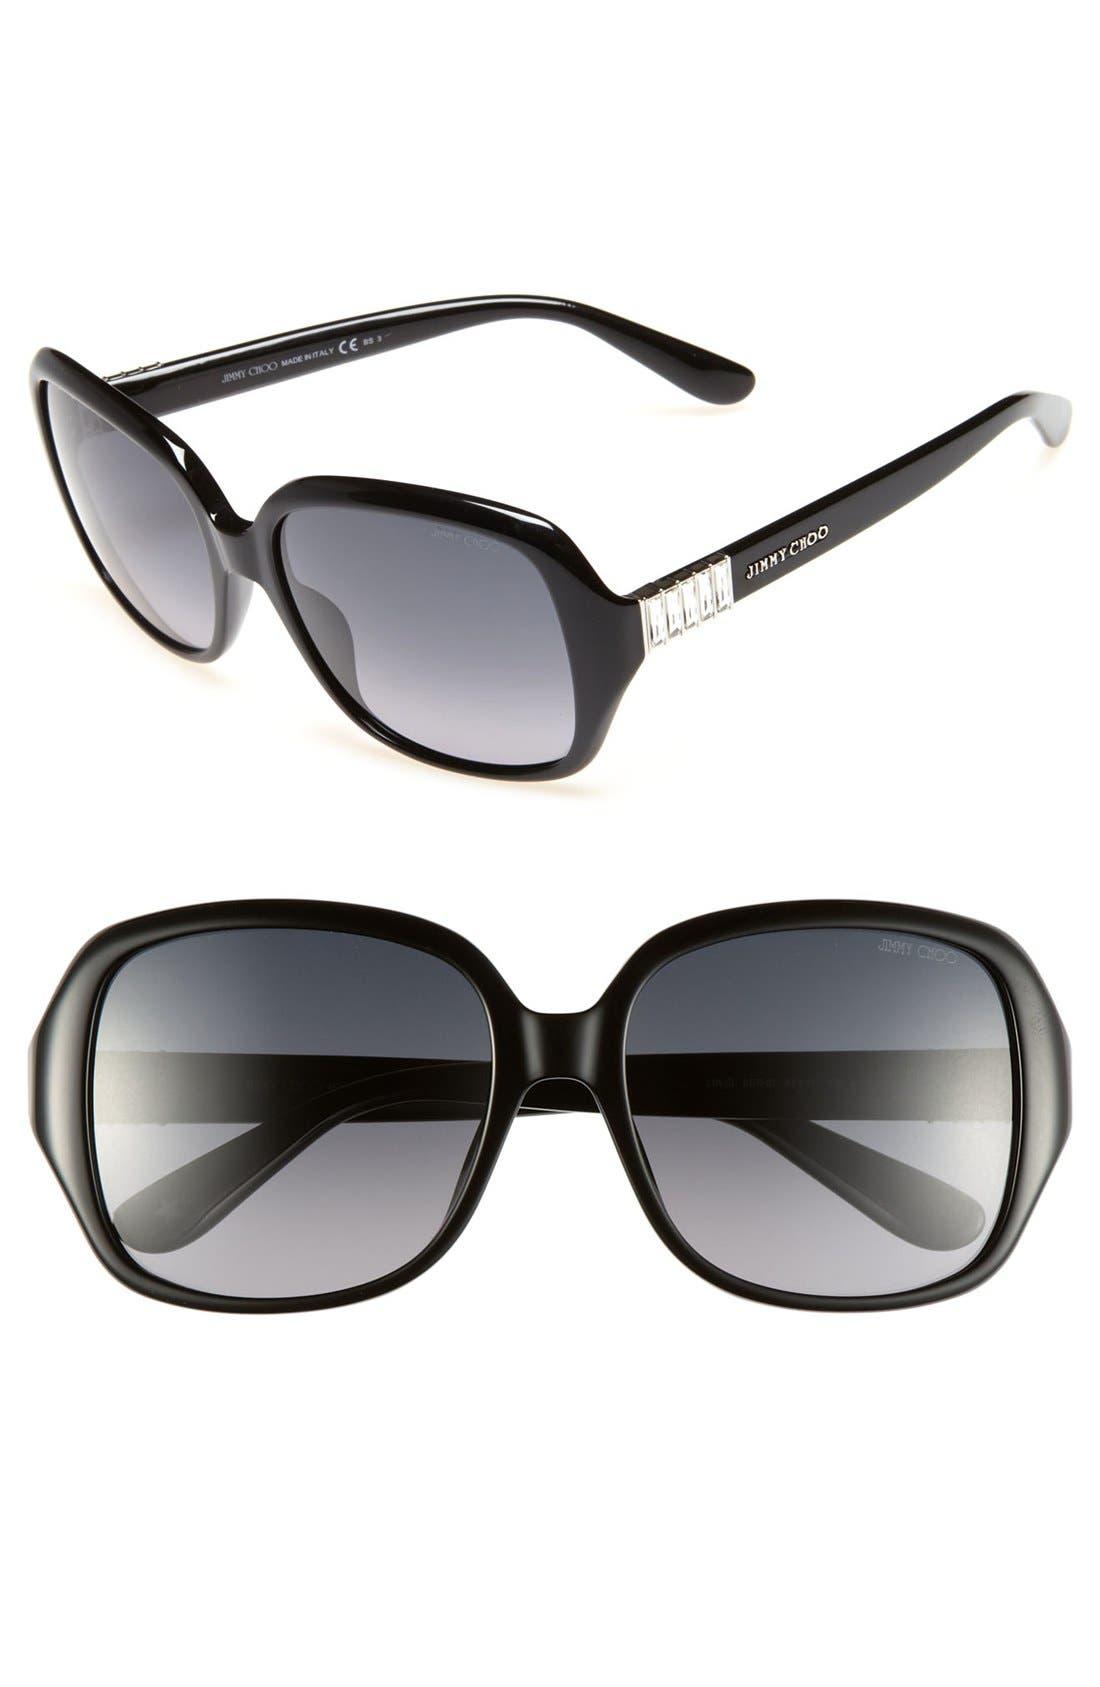 Alternate Image 1 Selected - Jimmy Choo 'Lia' 56mm Sunglasses